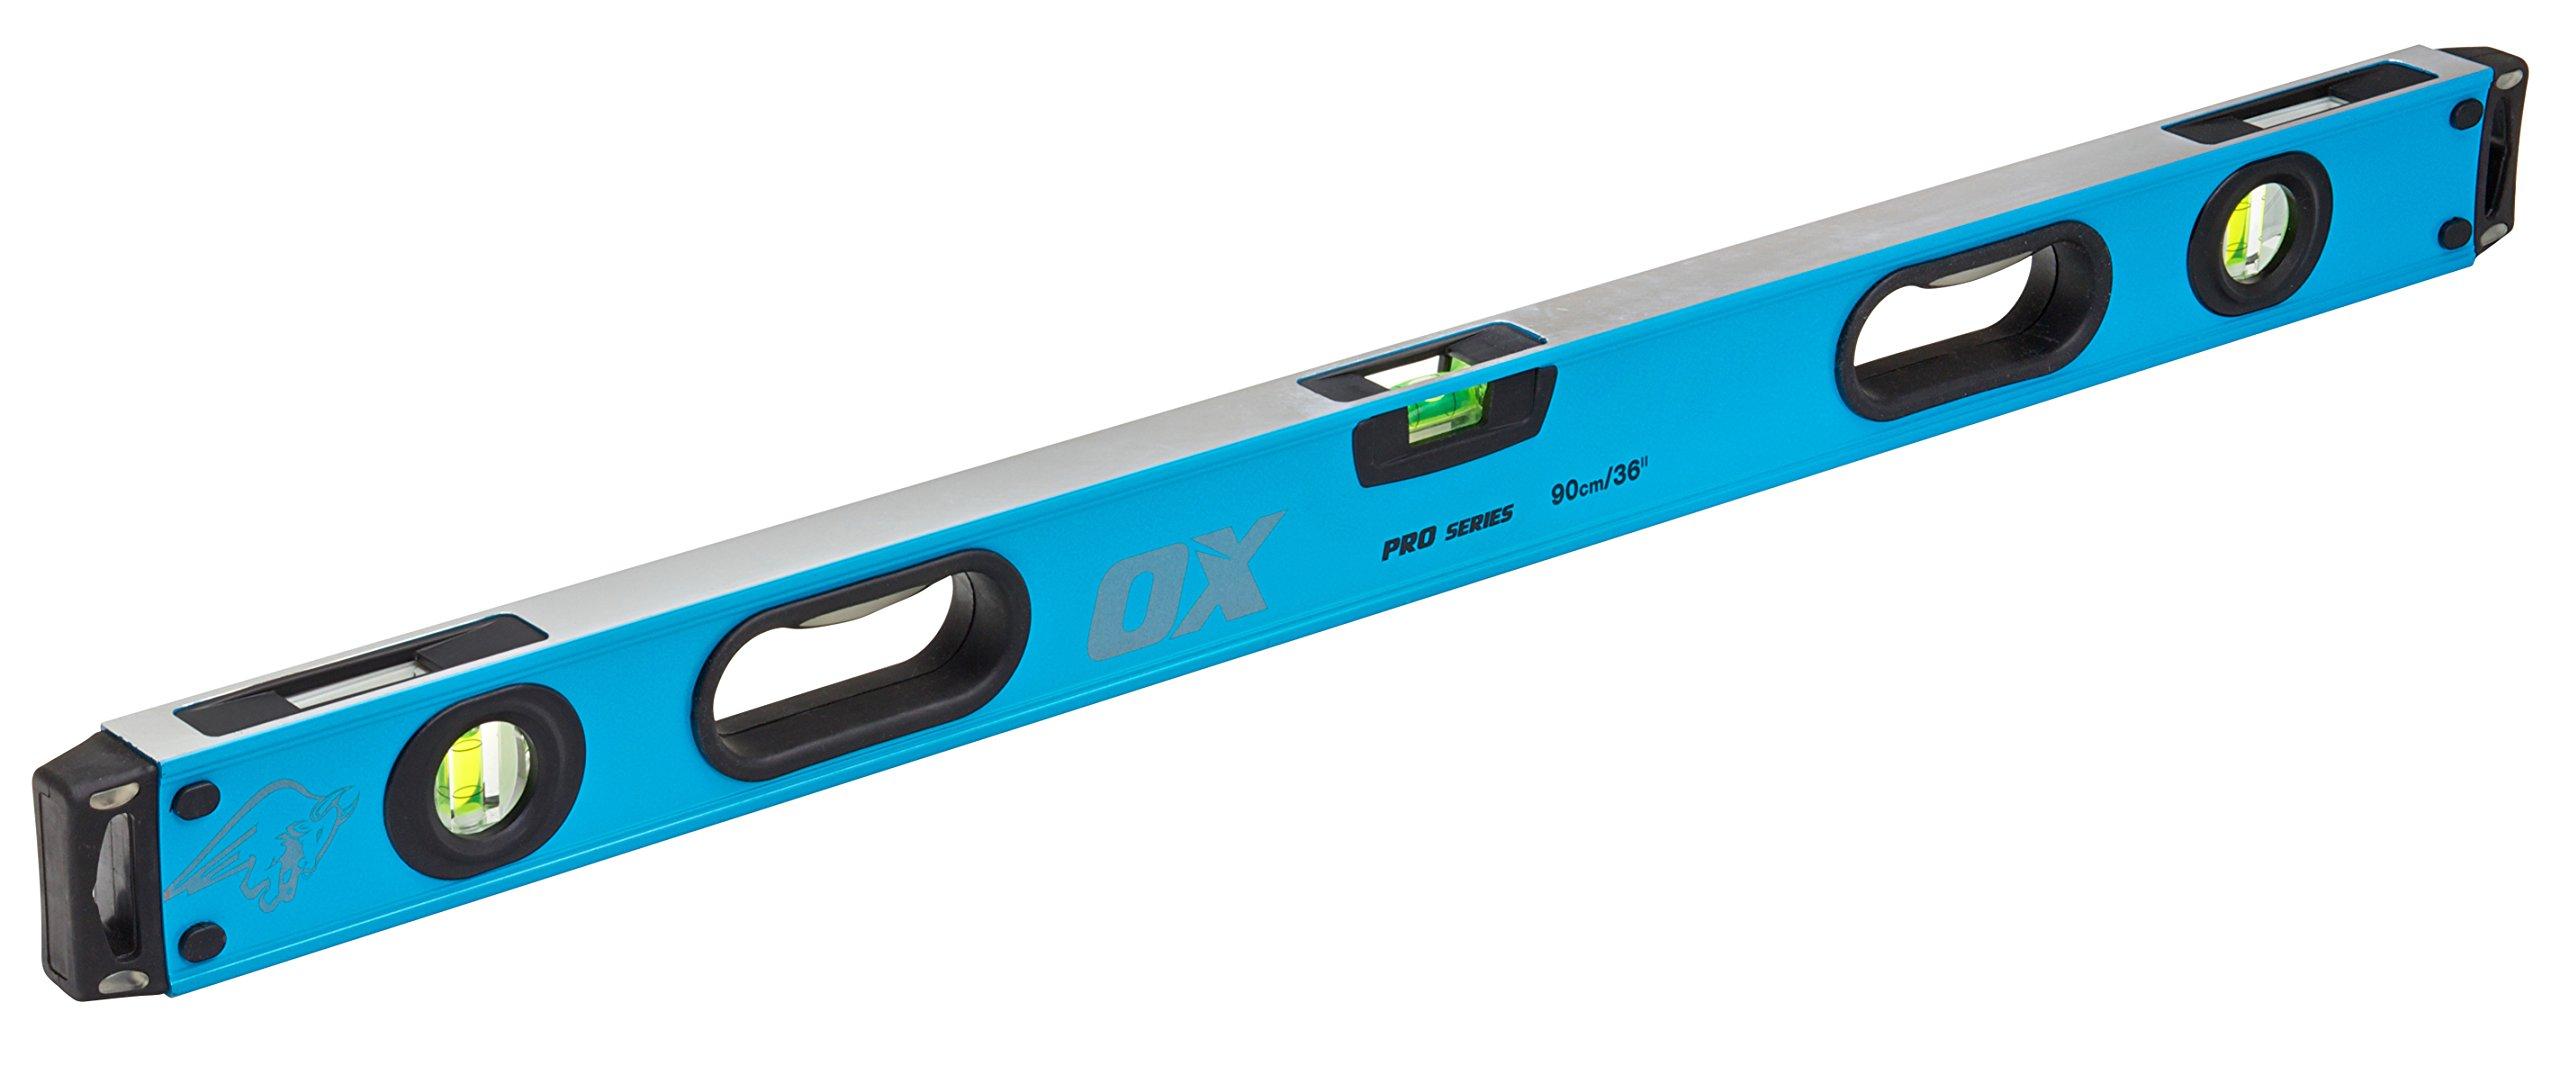 OX Tools Heavy-Duty Box Level - 36'' by OX Tools (Image #1)